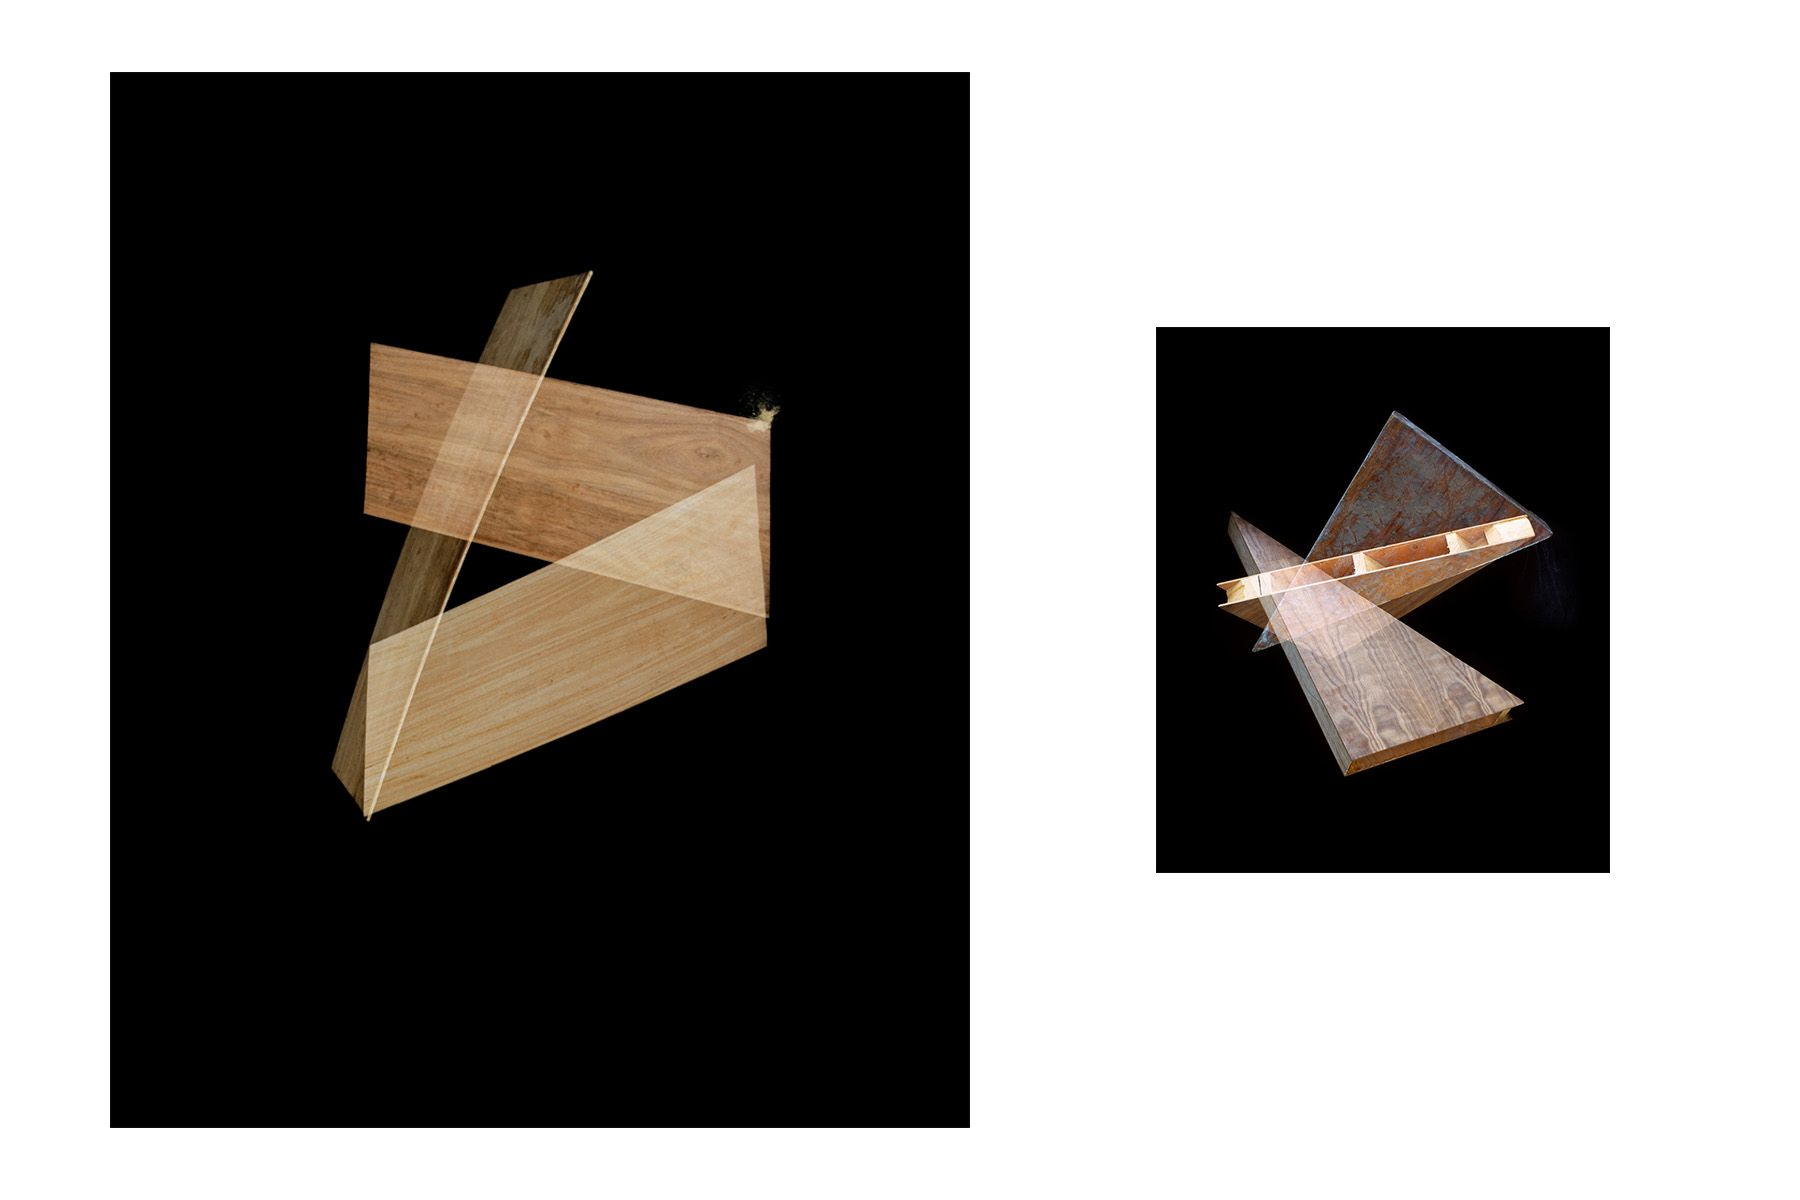 Tripartita, 2014 (left) ; Triangle Variations, 2014 (right)